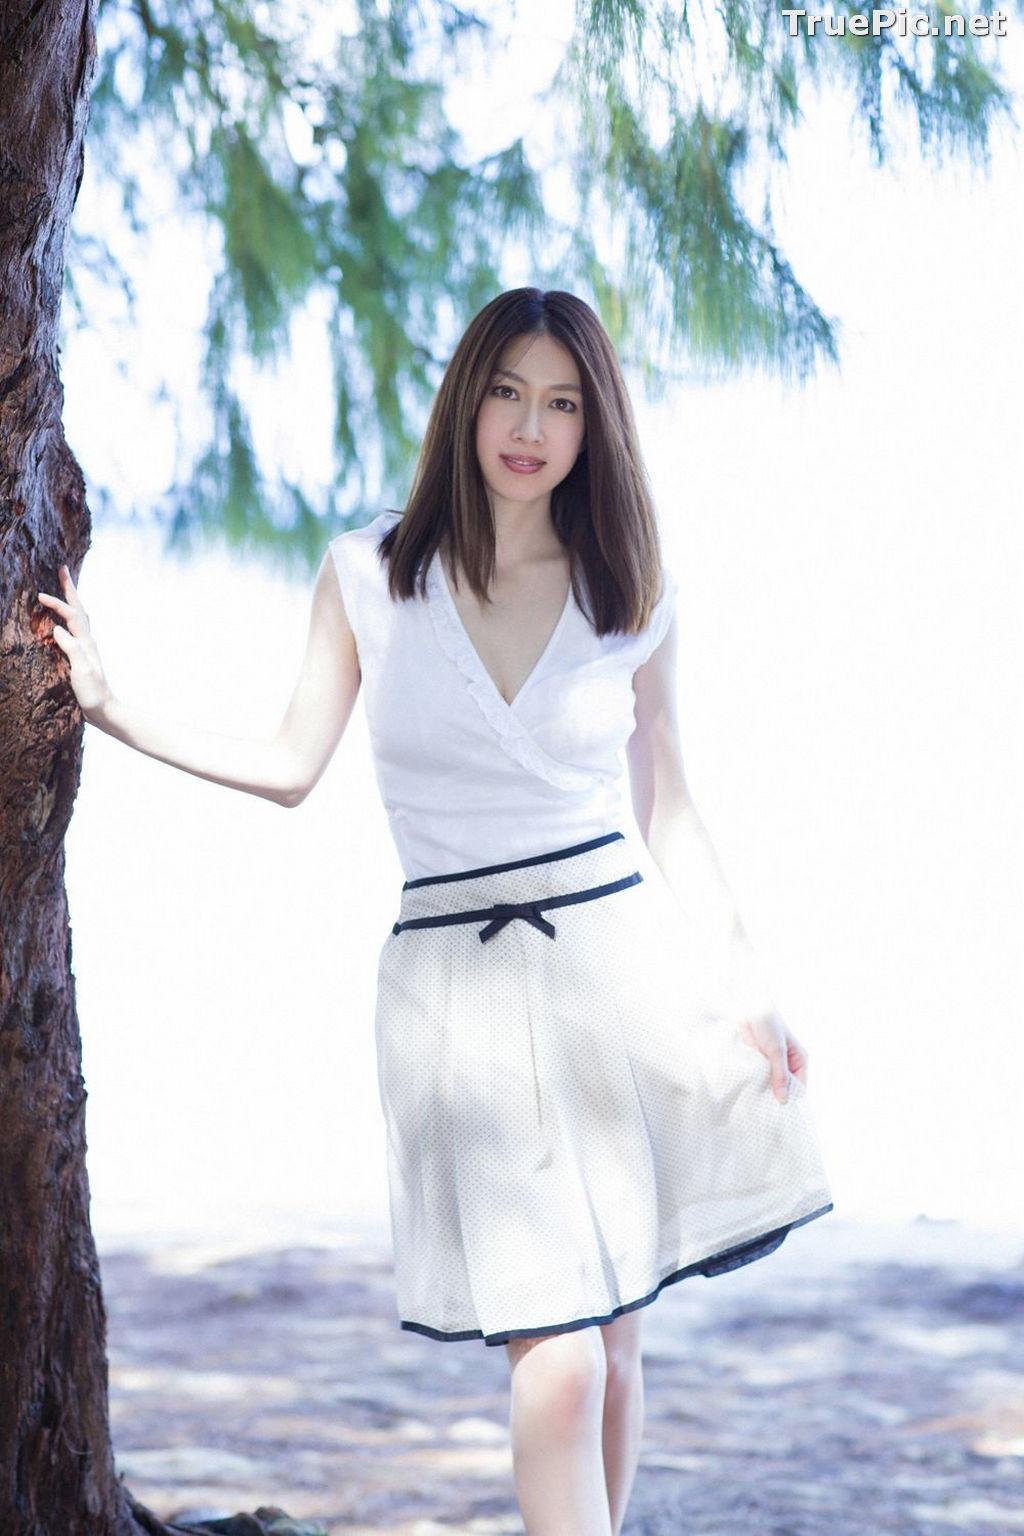 Image YS Web Vol.643 - Japanese Gravure Idol - Emi Kobayashi - TruePic.net - Picture-1